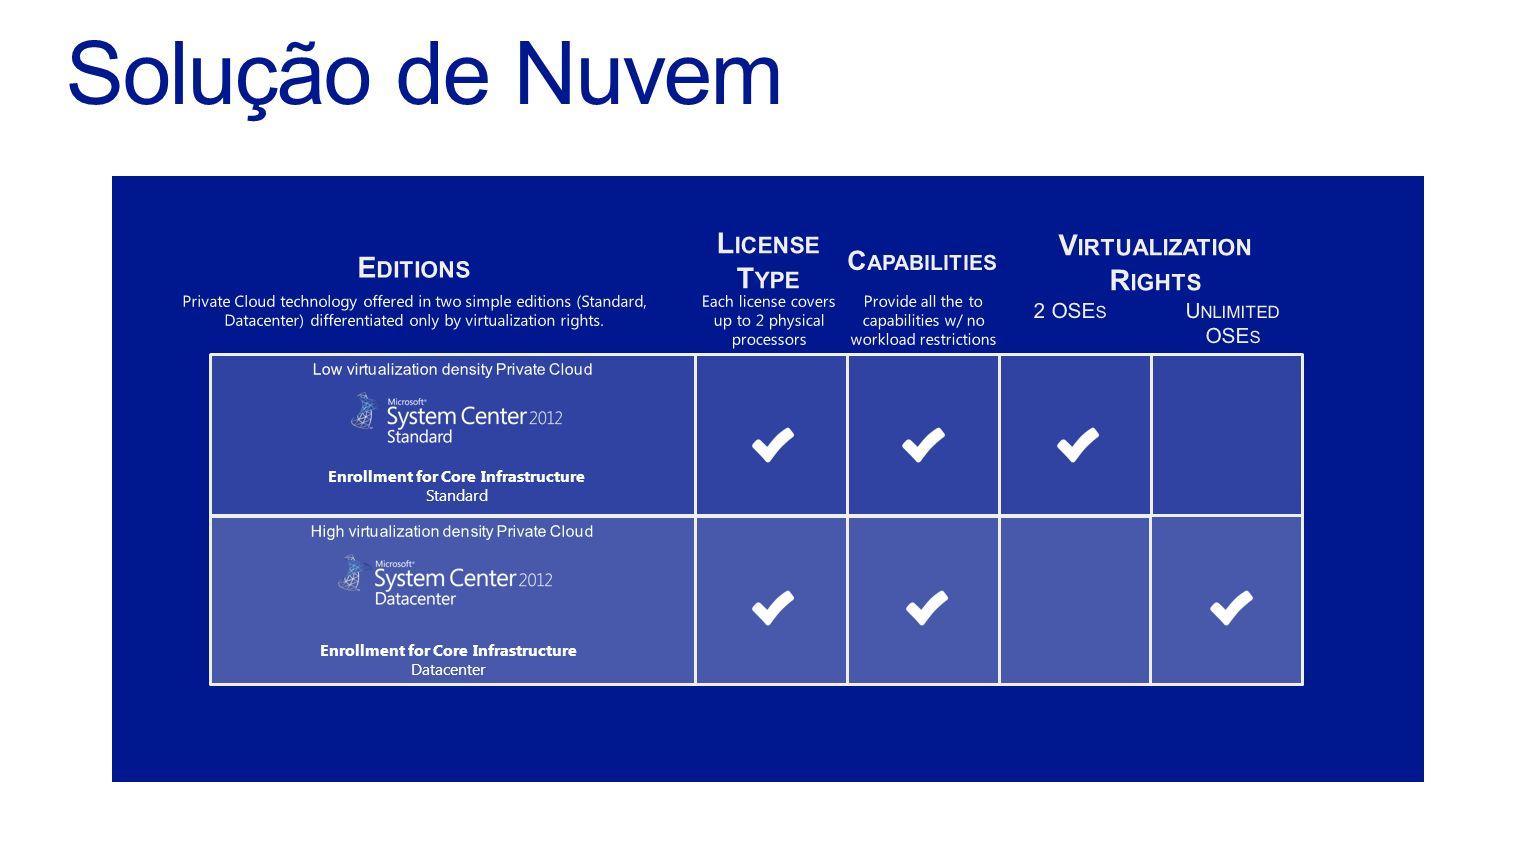 Enrollment for Core Infrastructure Standard Enrollment for Core Infrastructure Datacenter